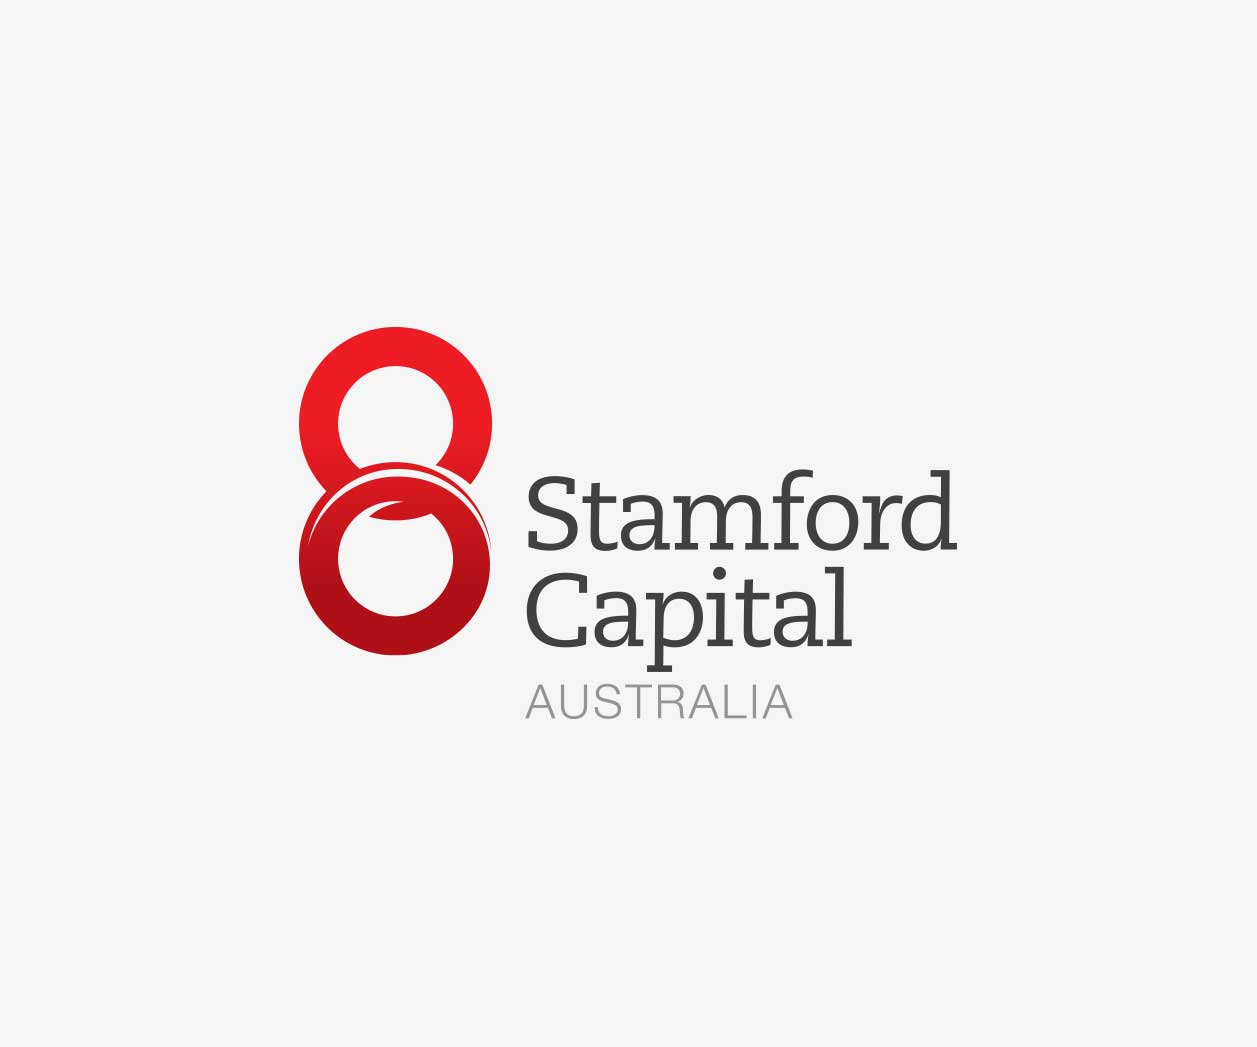 Stamford Capital